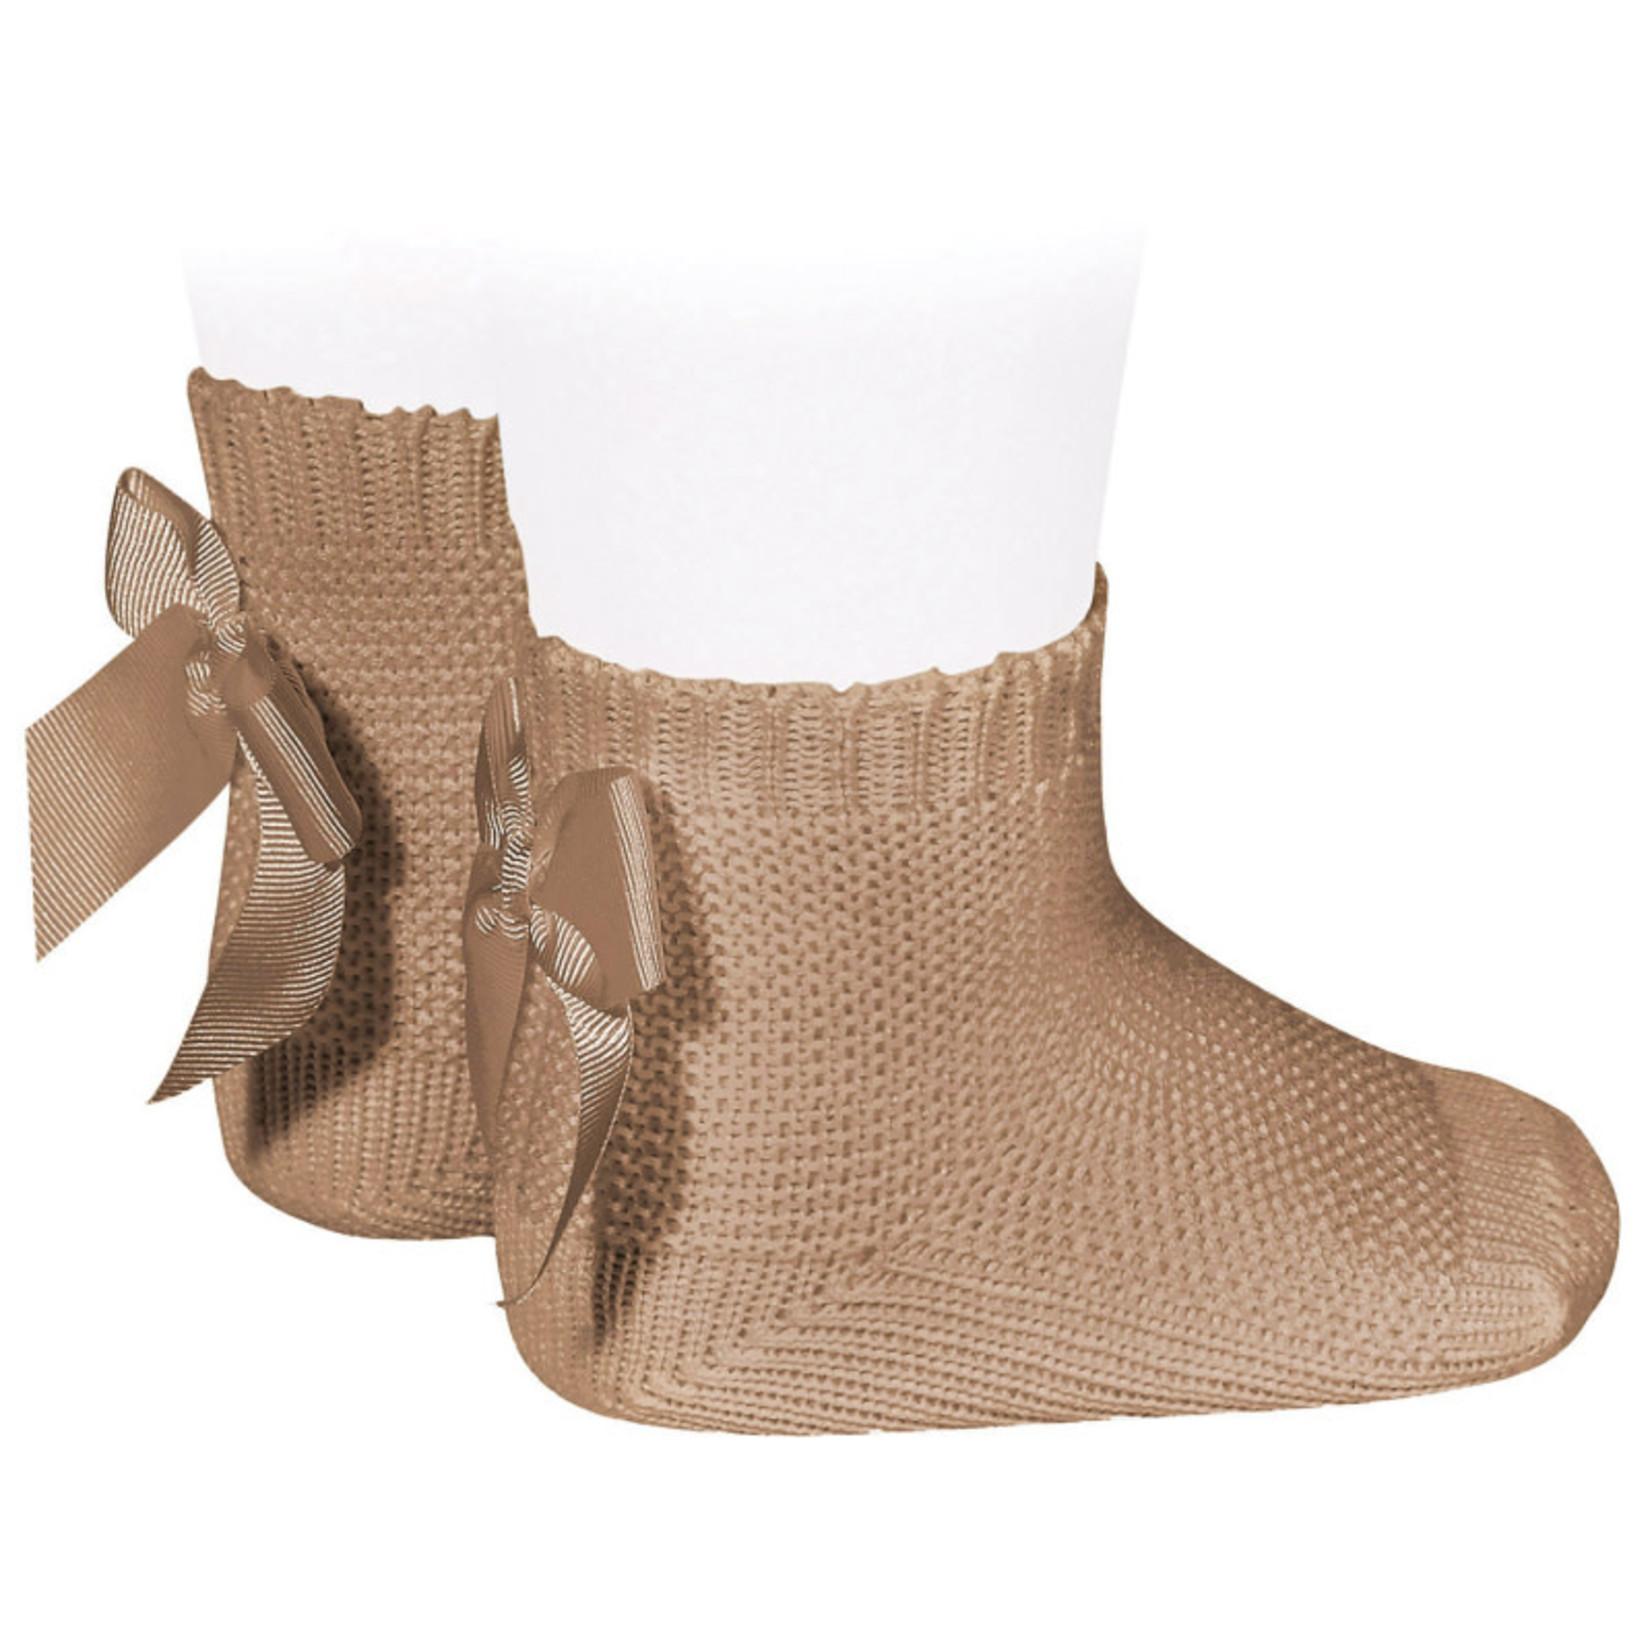 Condor Socks Open b/Bow - Camel